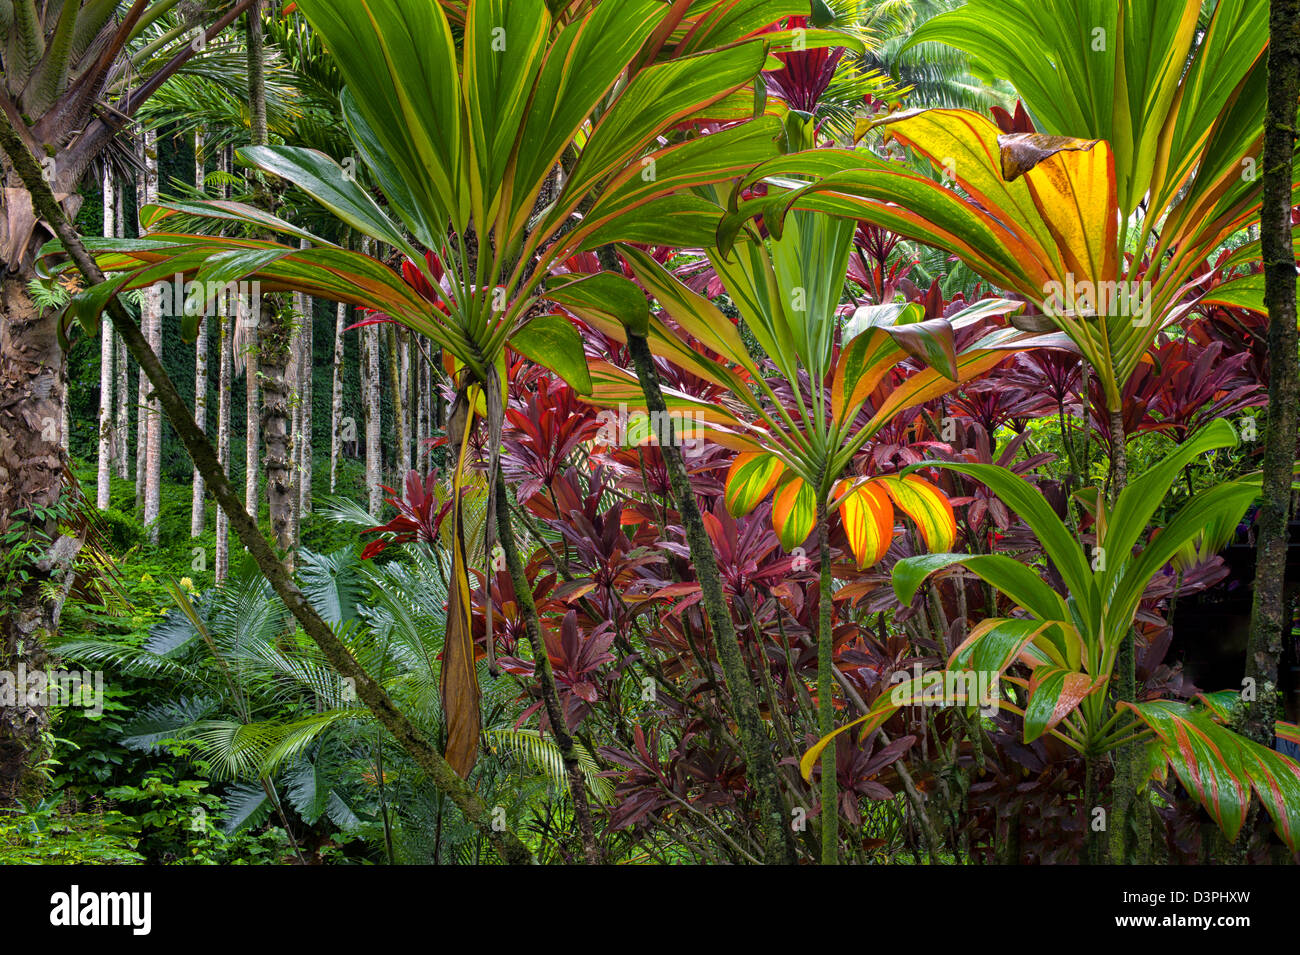 Tropical Plants Stock Photos & Tropical Plants Stock Images - Alamy